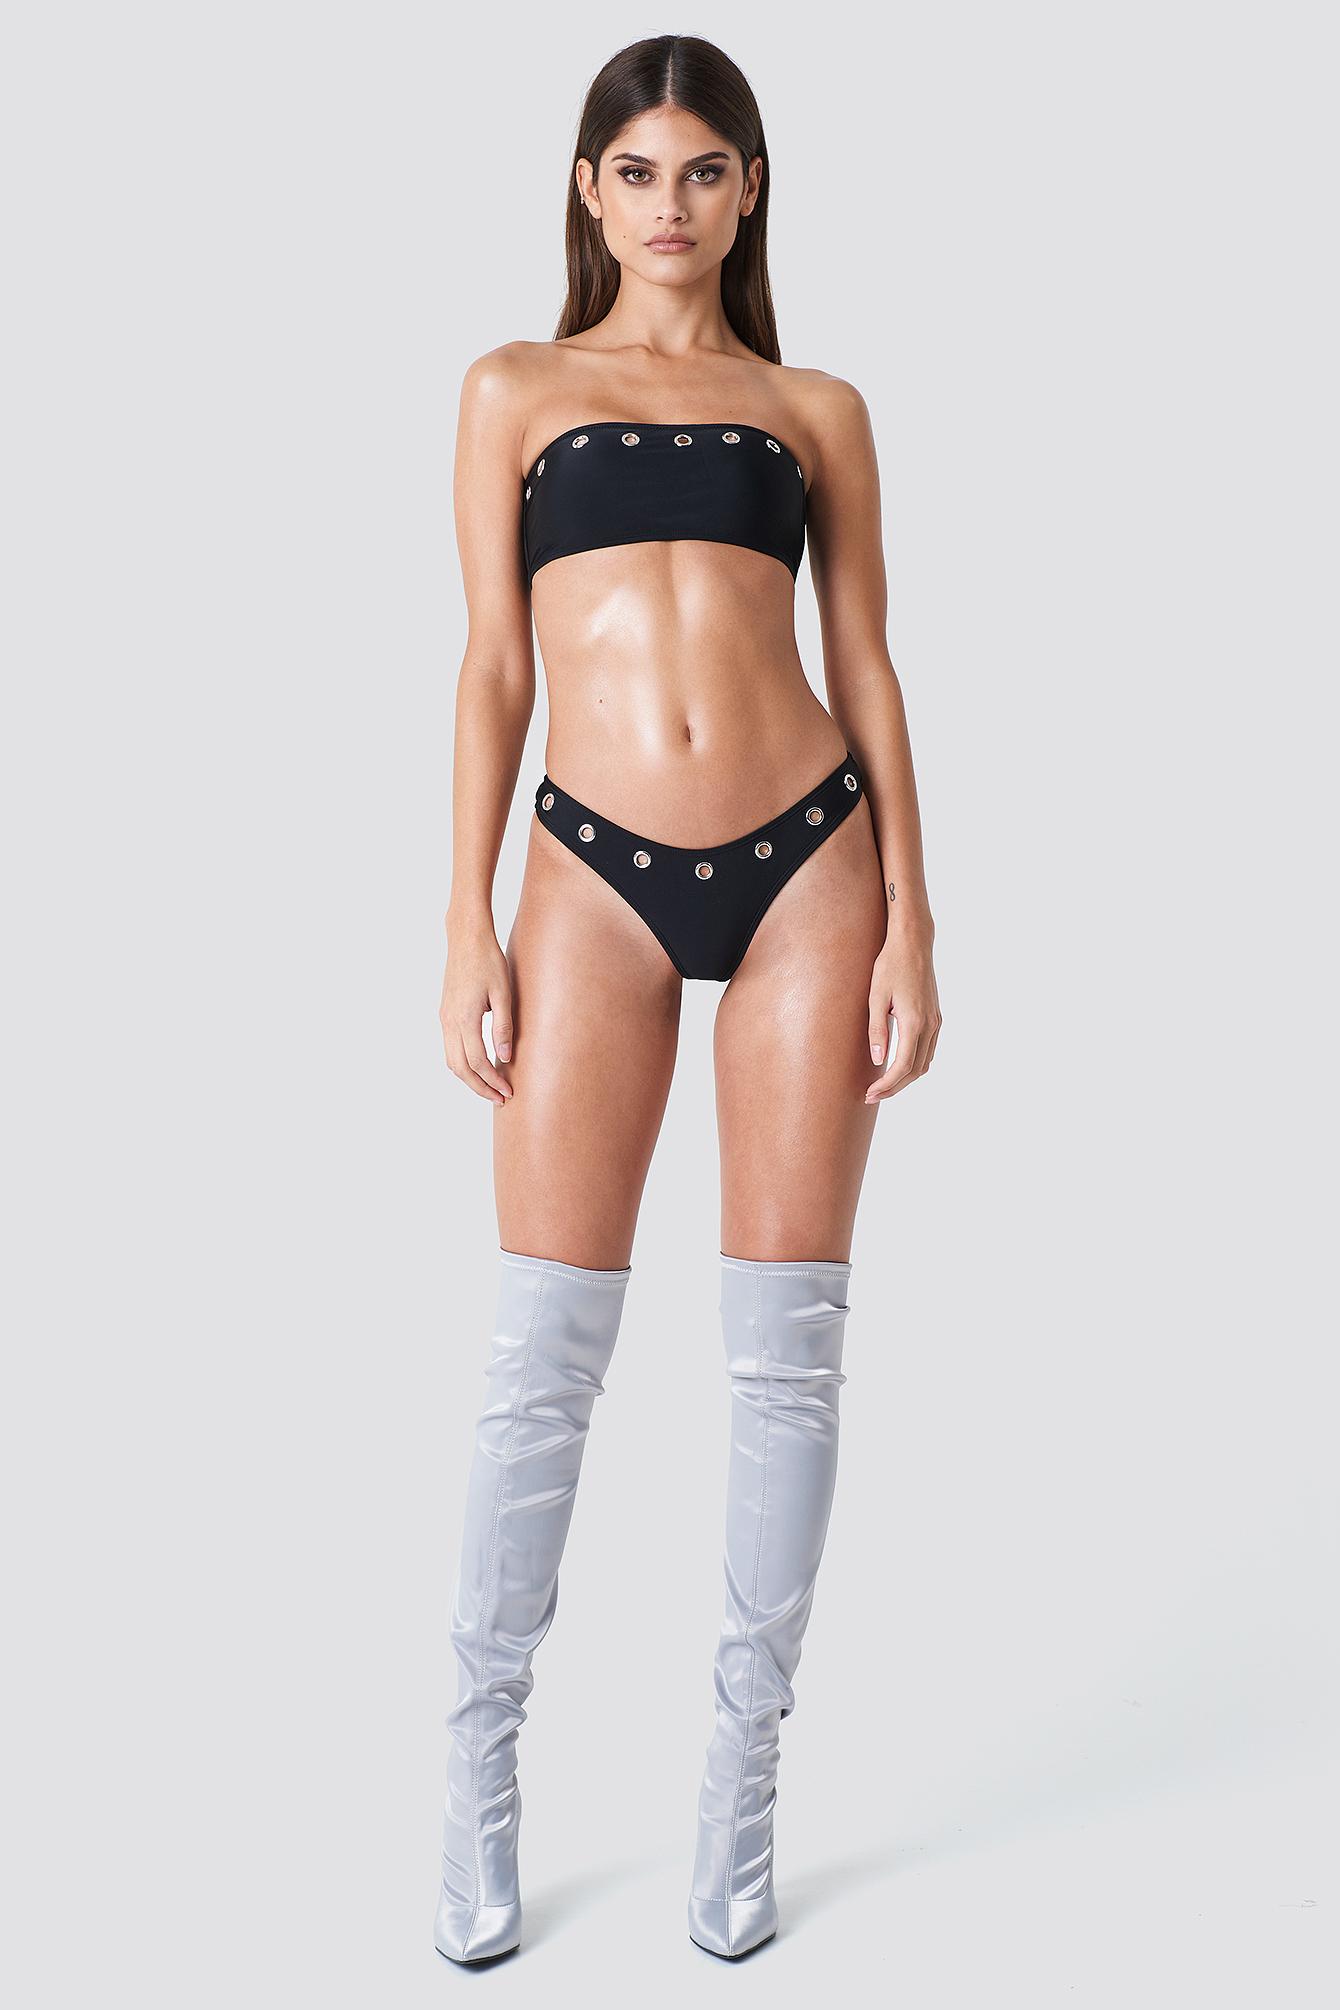 SAHARA RAY X NA-KD Eyelet Bikini Bottom - Black